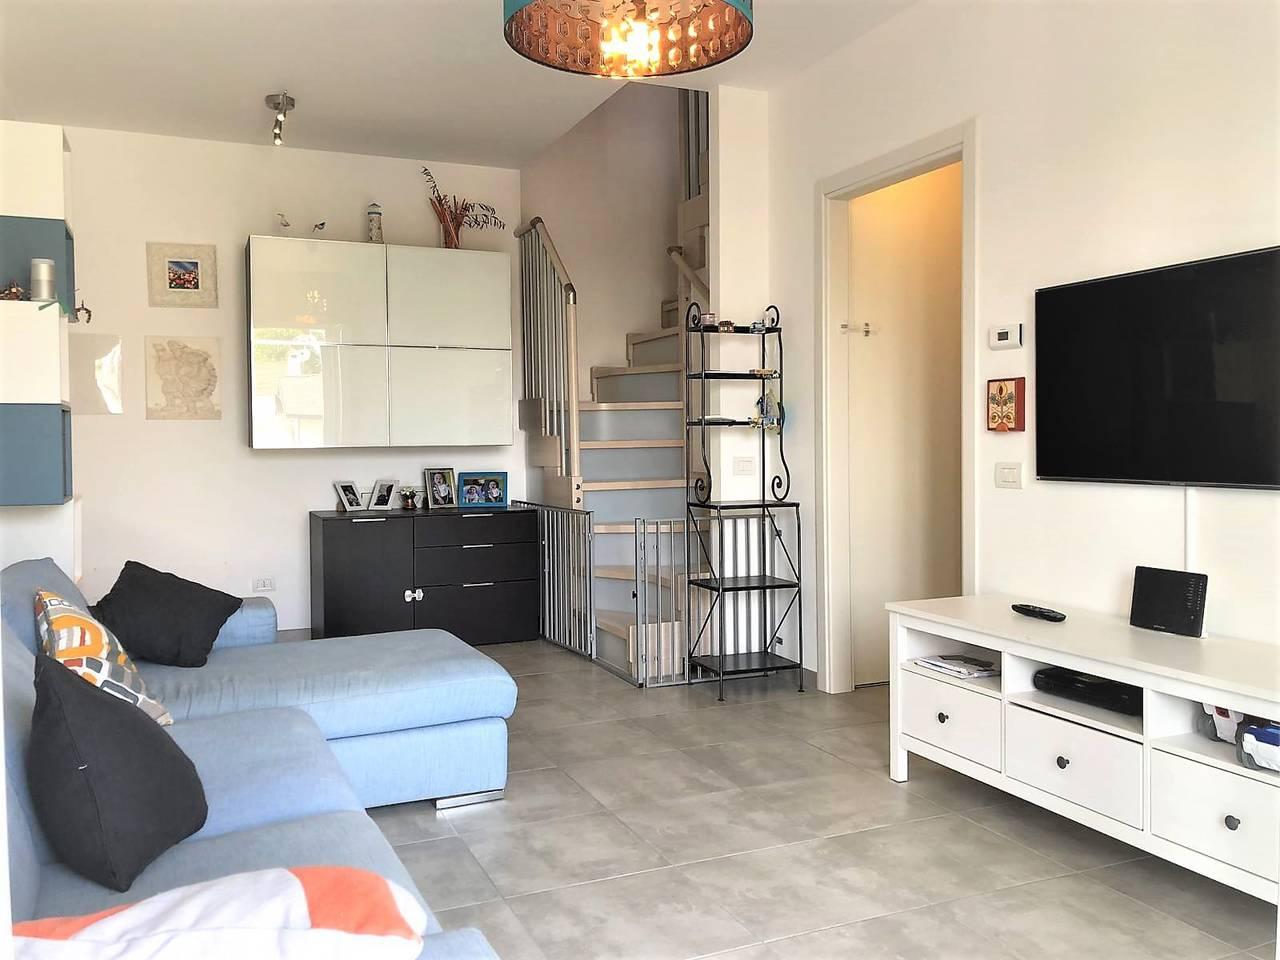 Appartamento-in-vendita-a-Busnago-in-Brianza-5